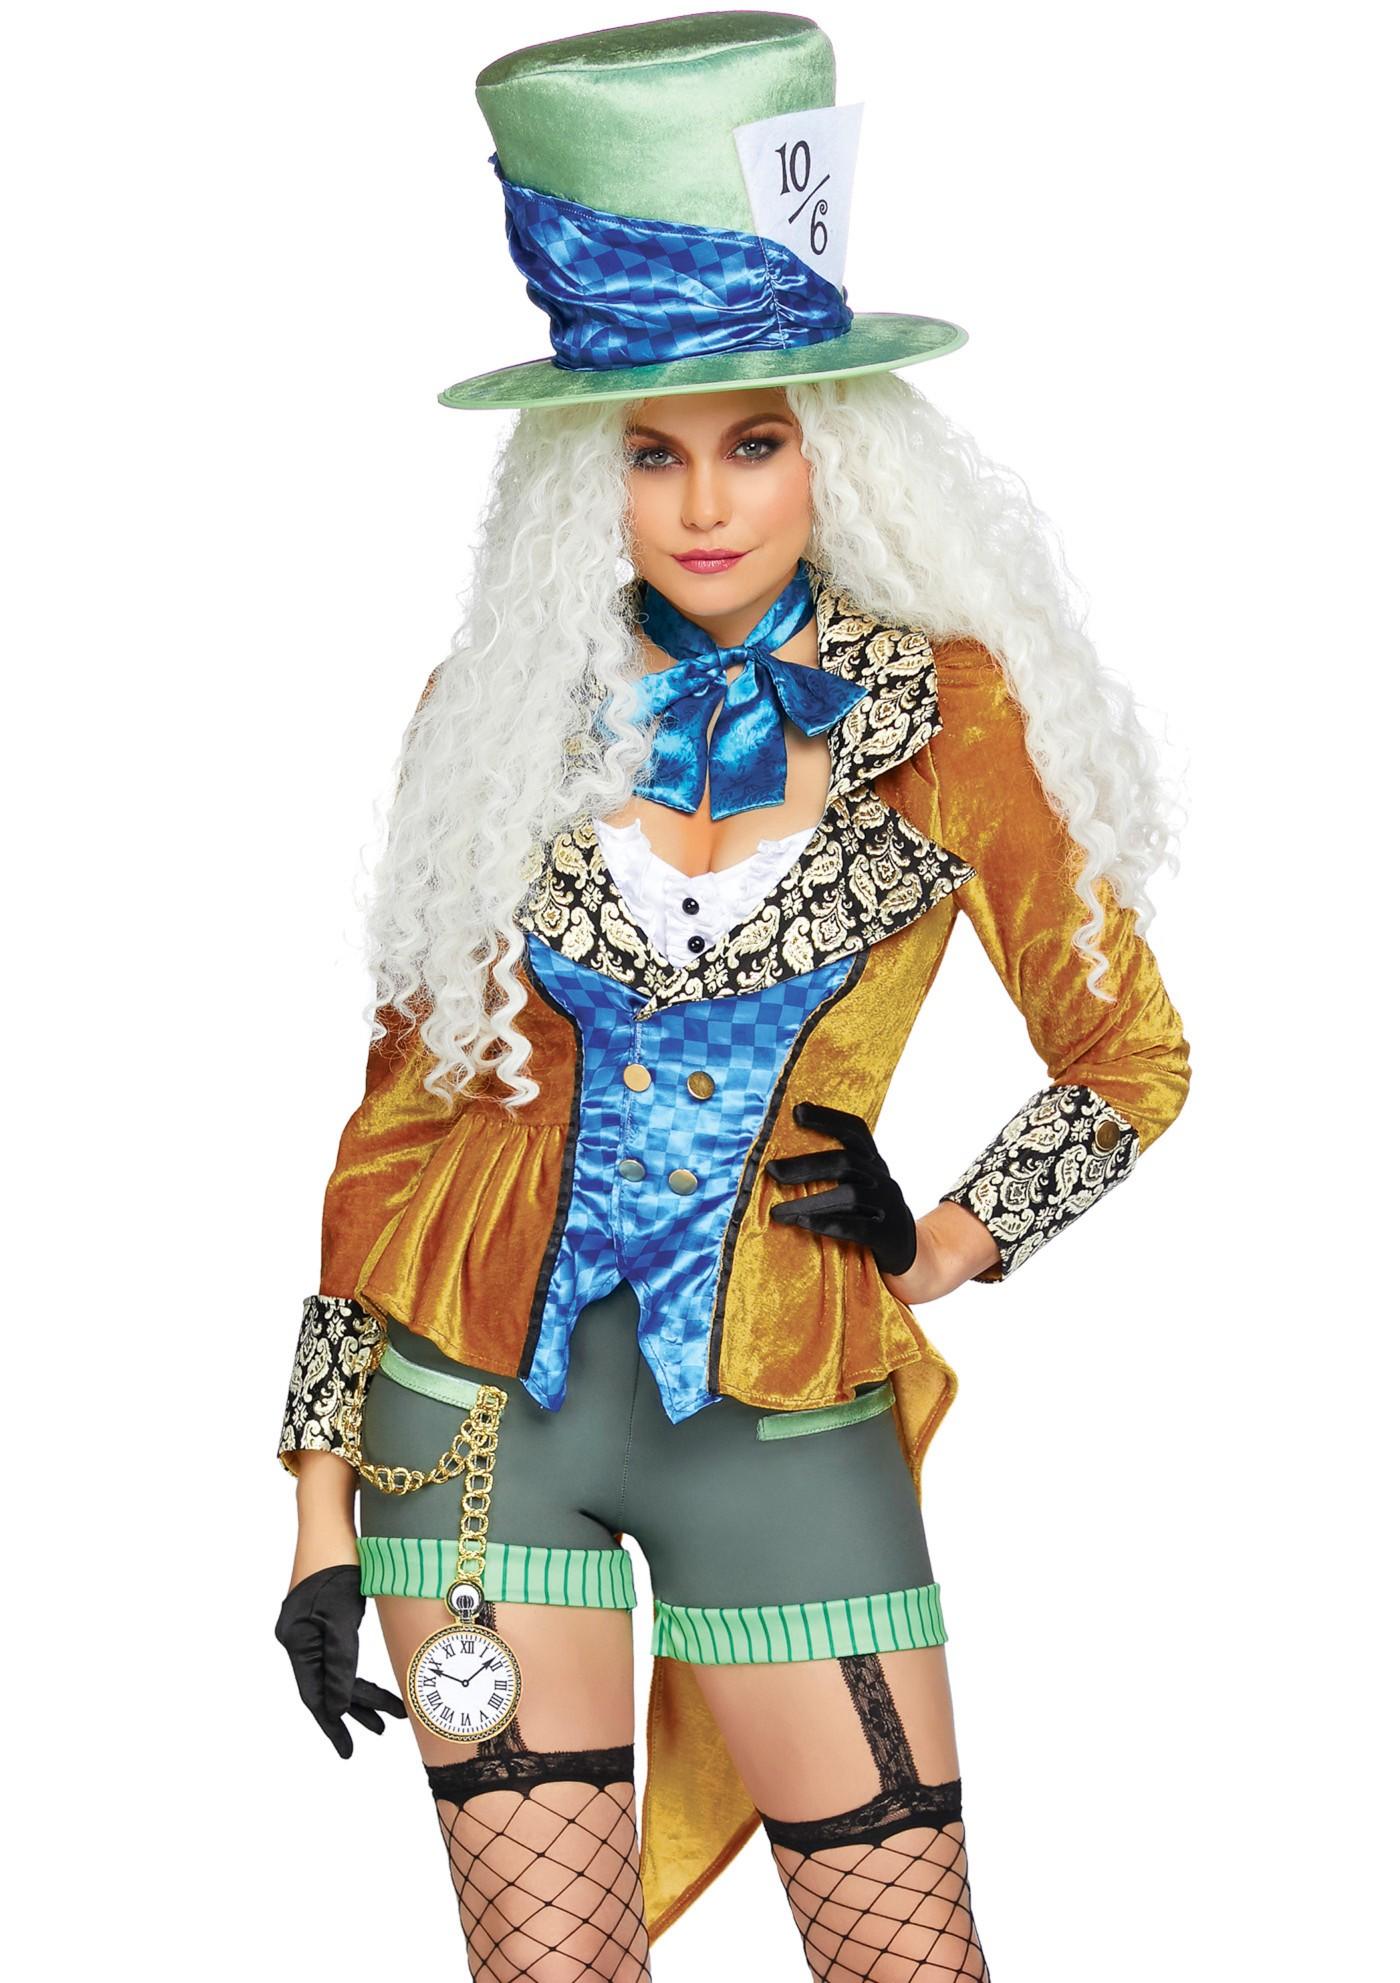 Costume Classic Mad Hatter - Leg Avenue